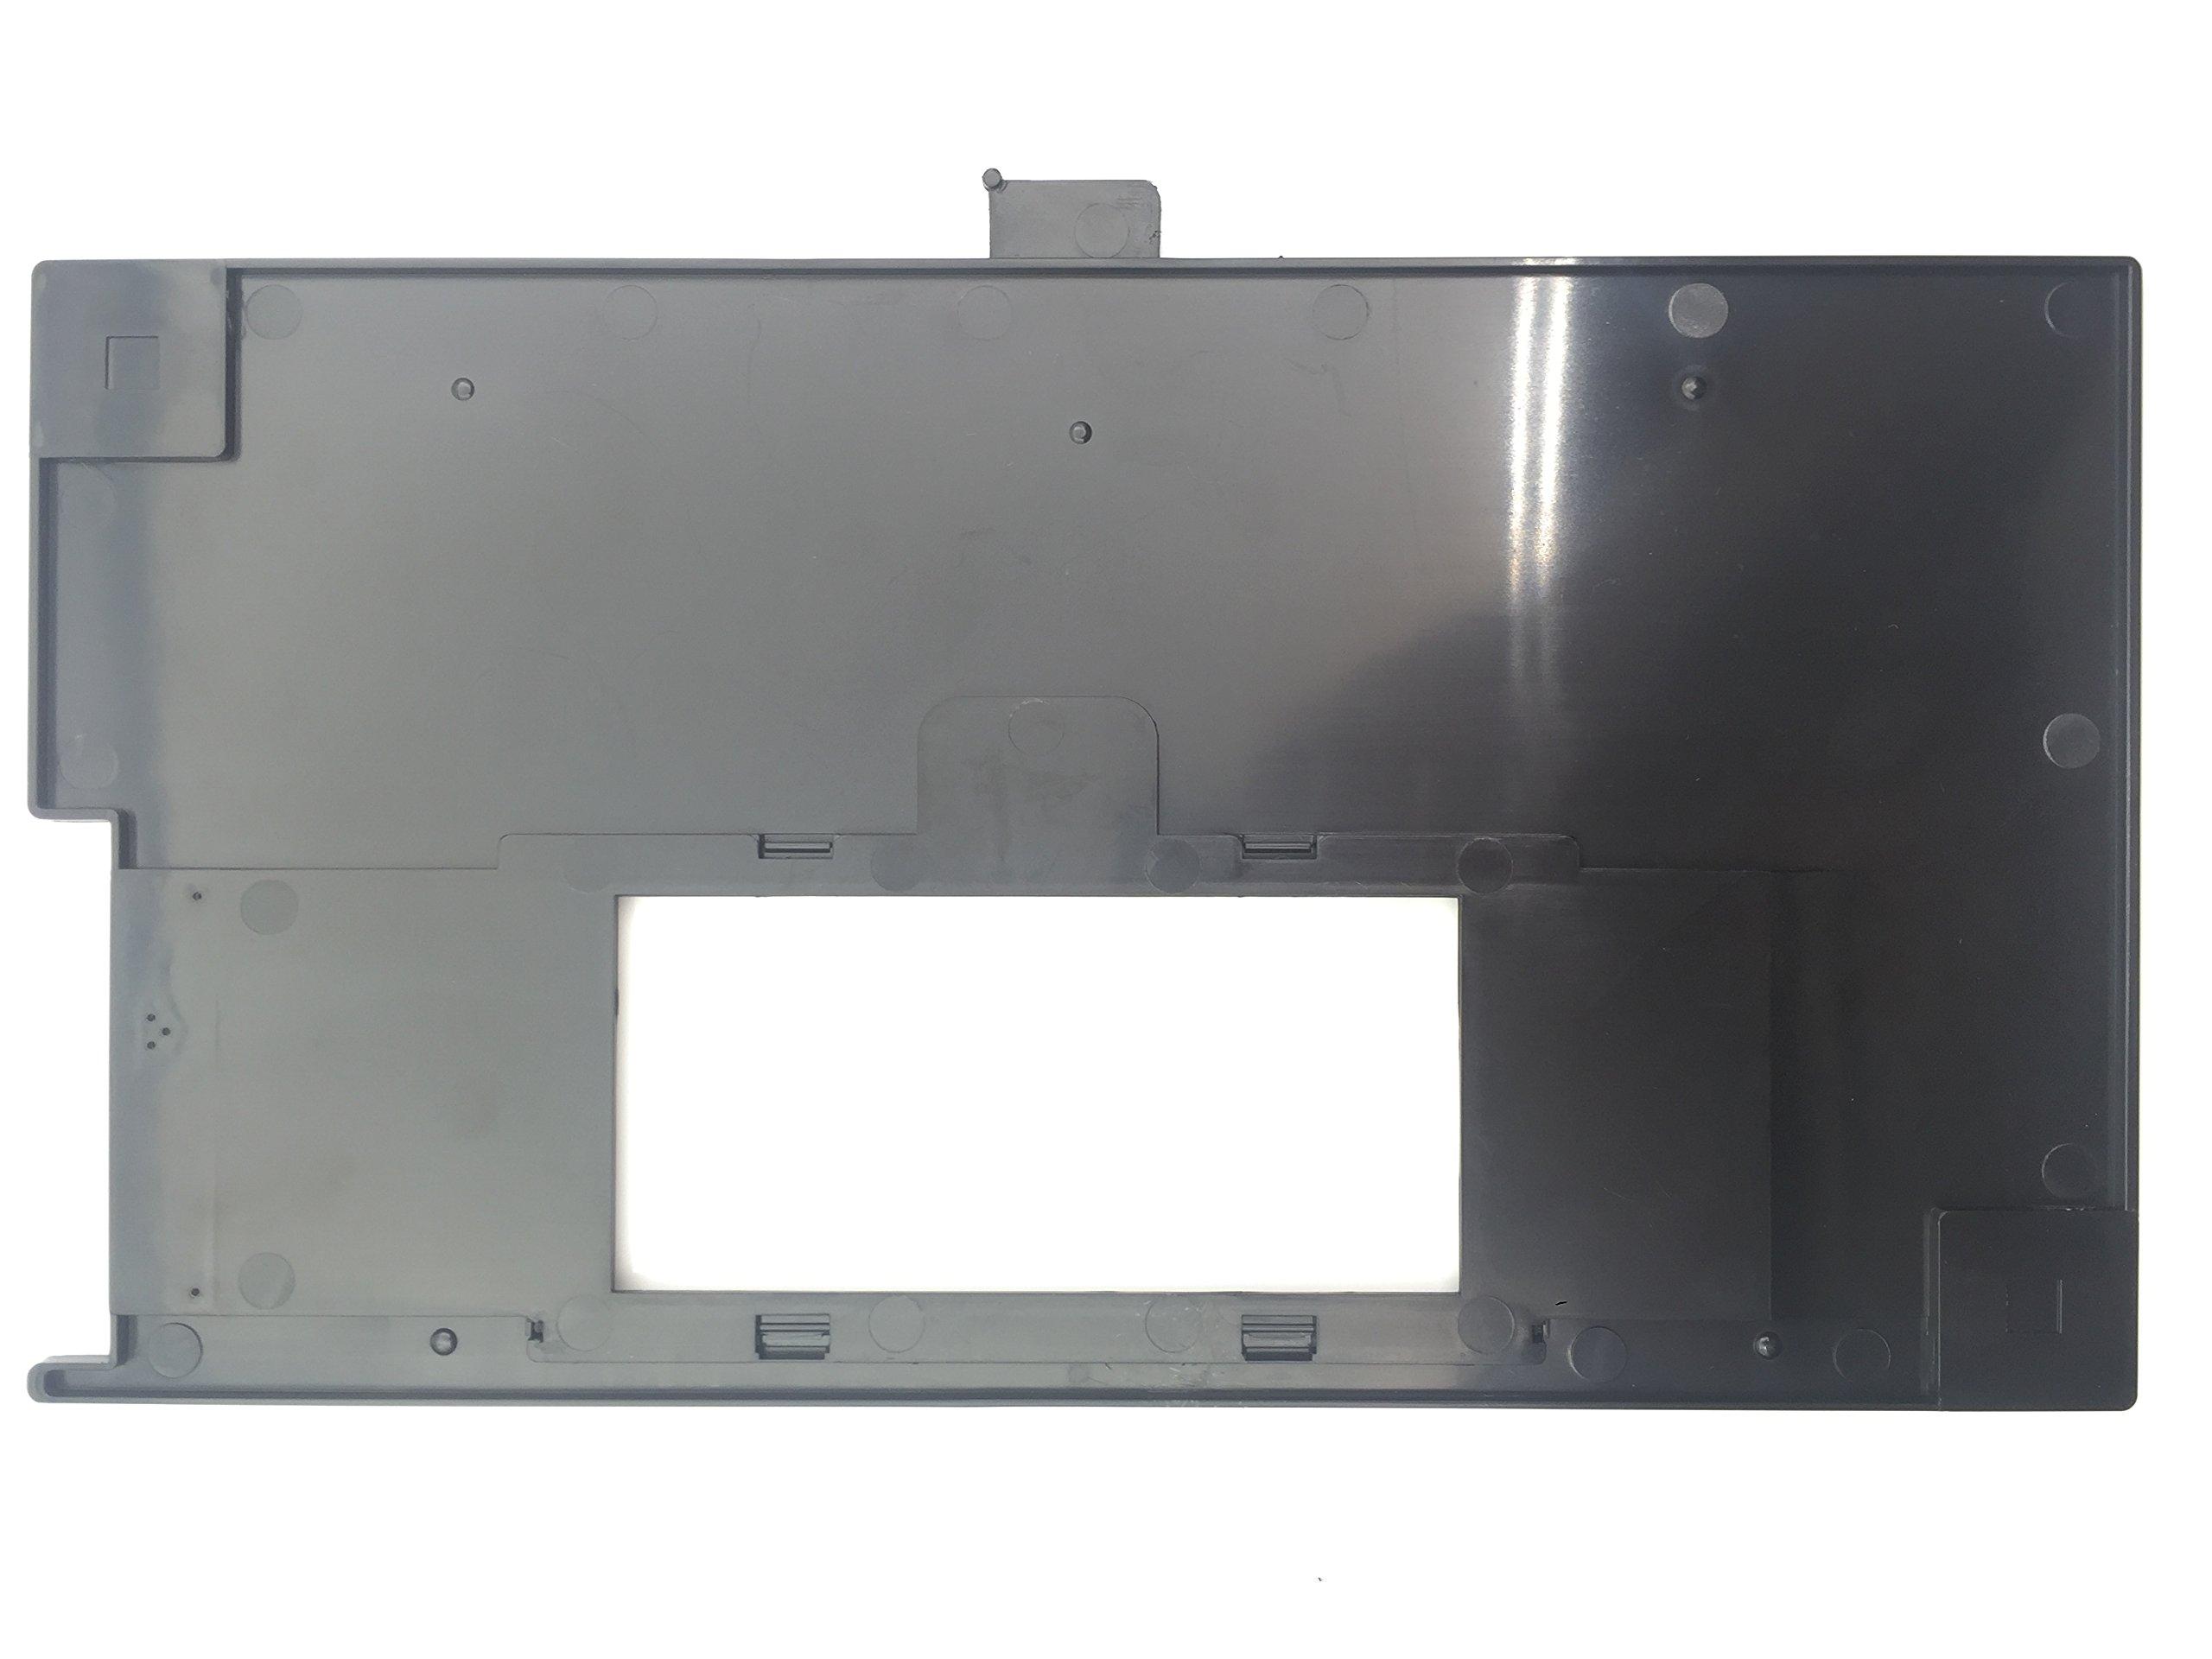 OKLILI 1401439 120 220 620 Photo Holder Film Brownie 120mm Film Guide for Epson Perfection V500 V550 V600 4490 4990 2450 3170 3200 4180 X 750 X770 X 820 by OKLILI (Image #3)